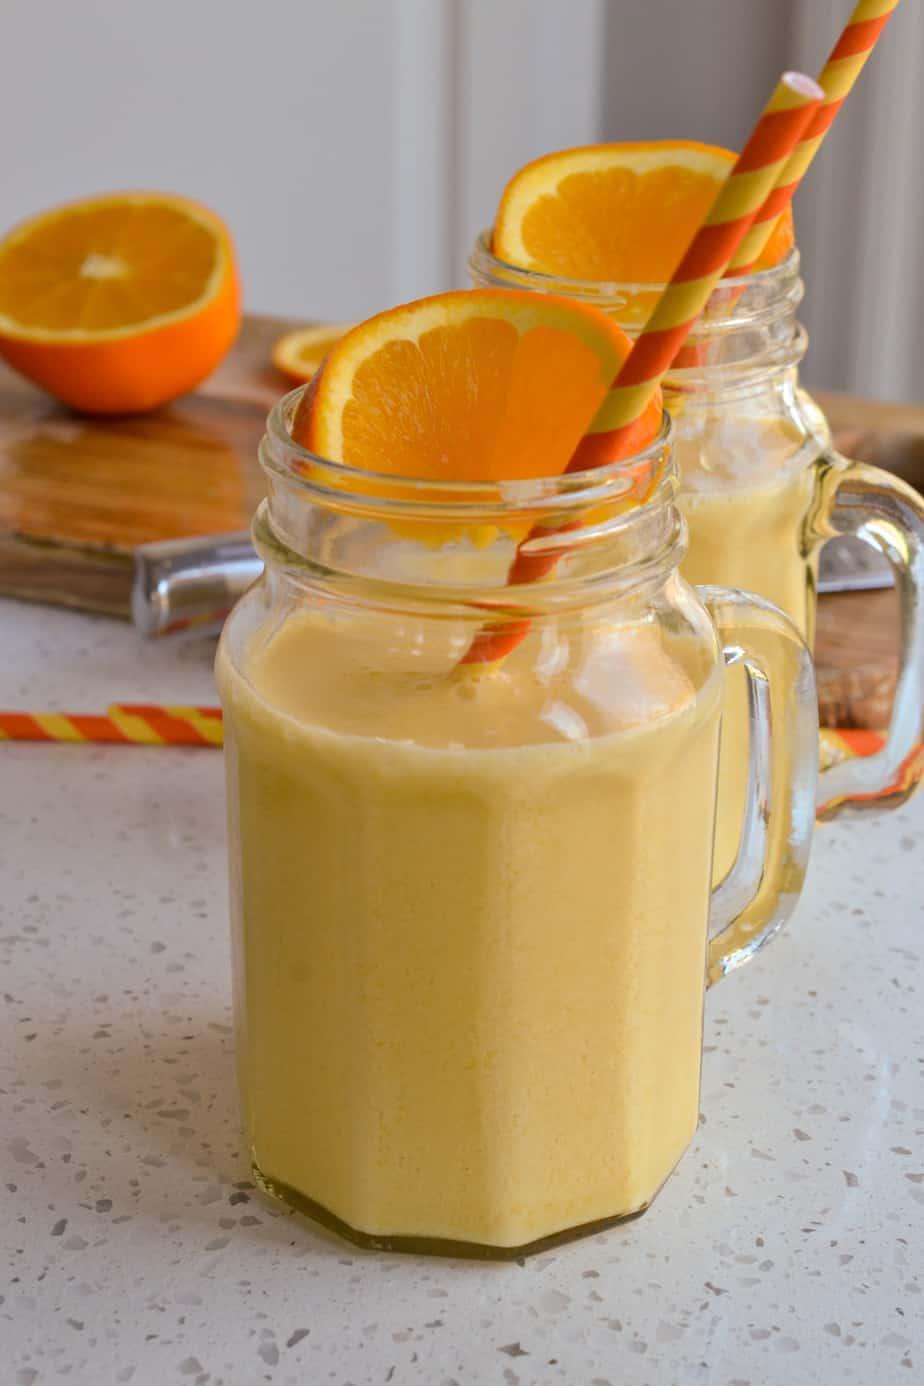 Homemade orange julius in glasses with orange slices and straws